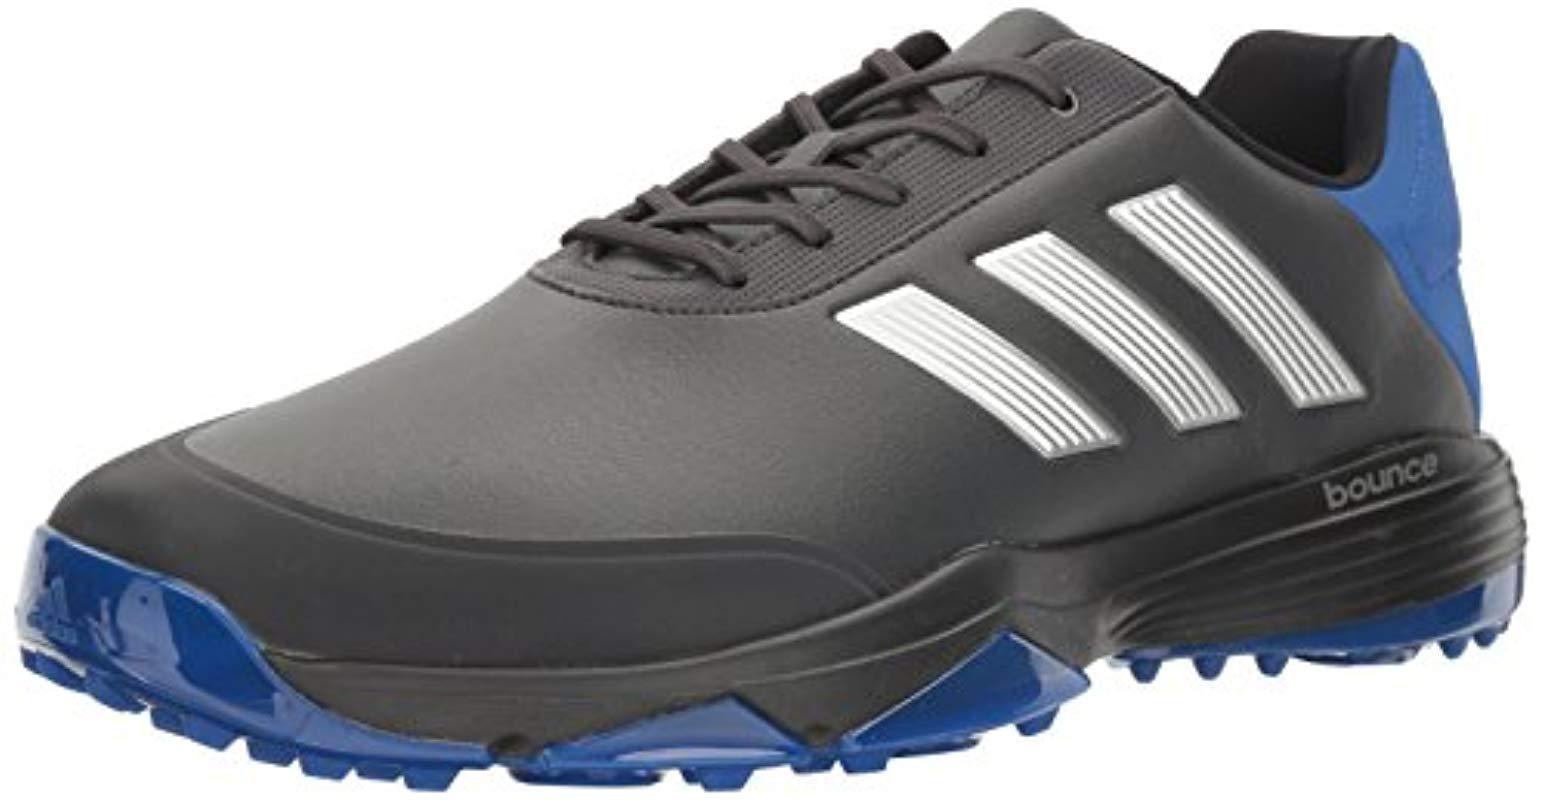 1dd6caae1697e Lyst - adidas Adipower Bounce Wd Ftwwht Golf Shoe in Black for Men ...